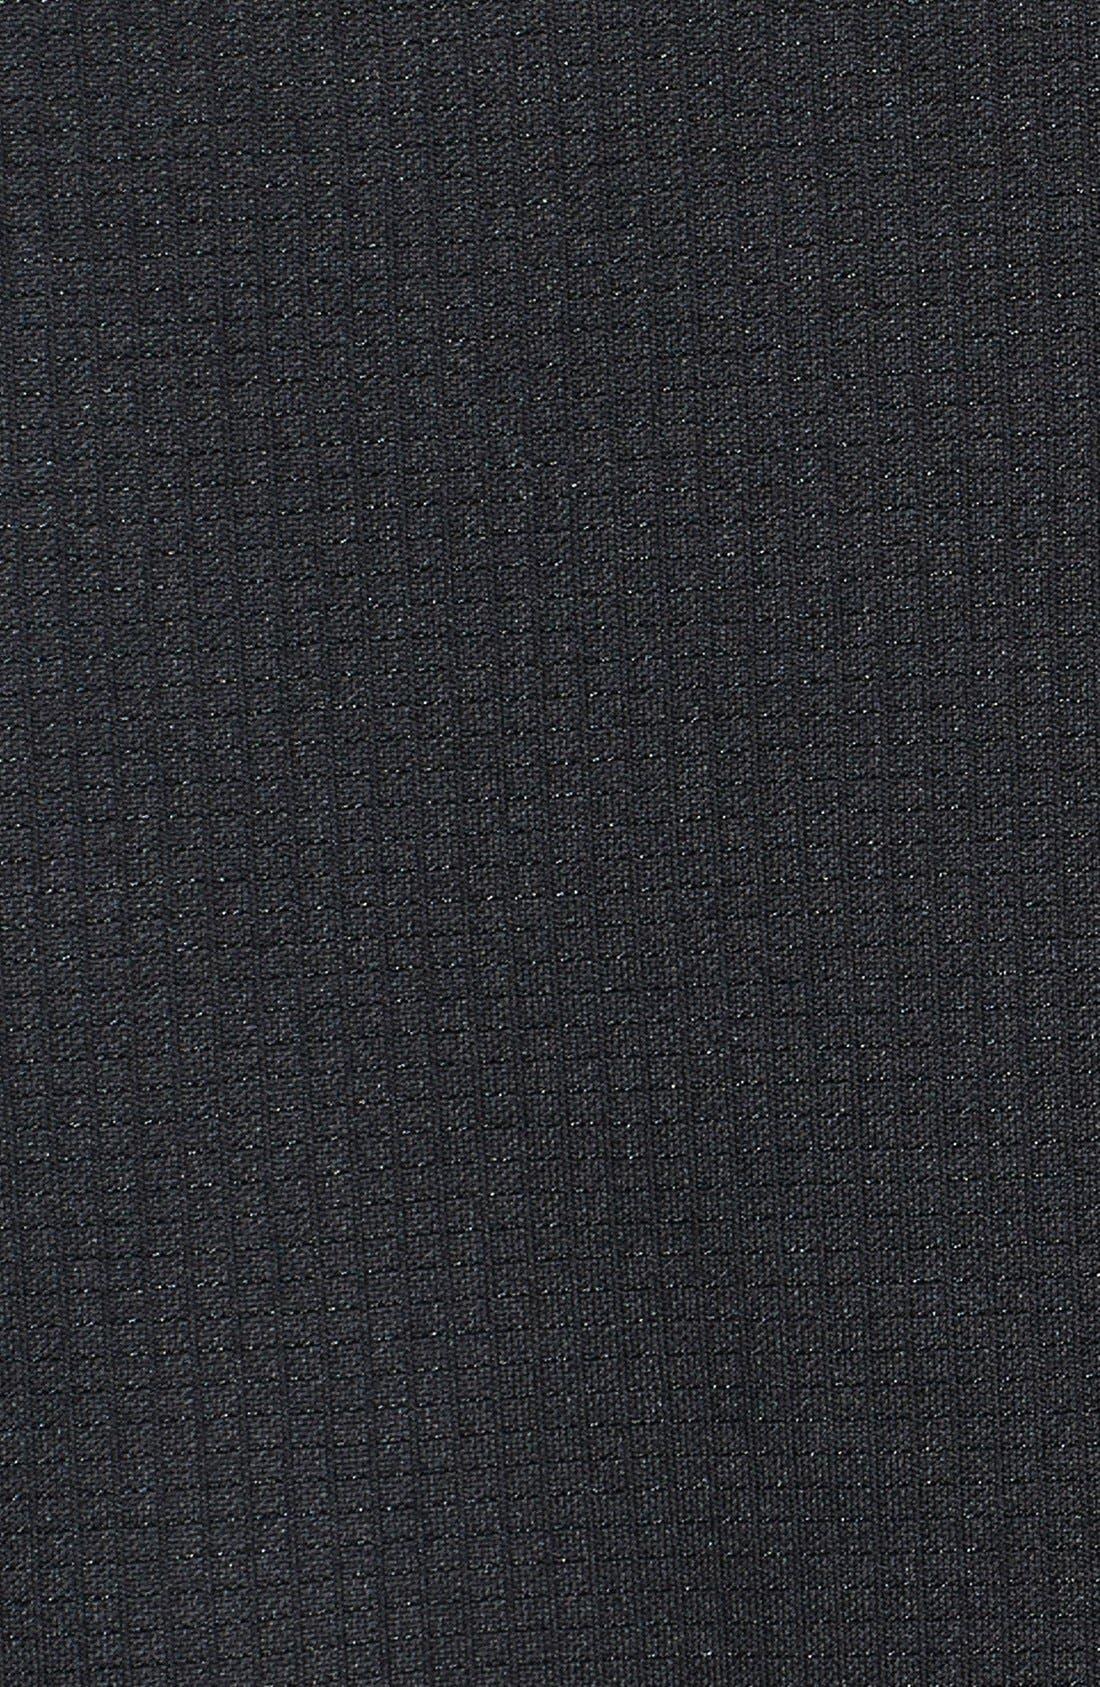 'New Orleans Saints - Genre' DryTec Moisture Wicking Polo,                             Alternate thumbnail 3, color,                             001